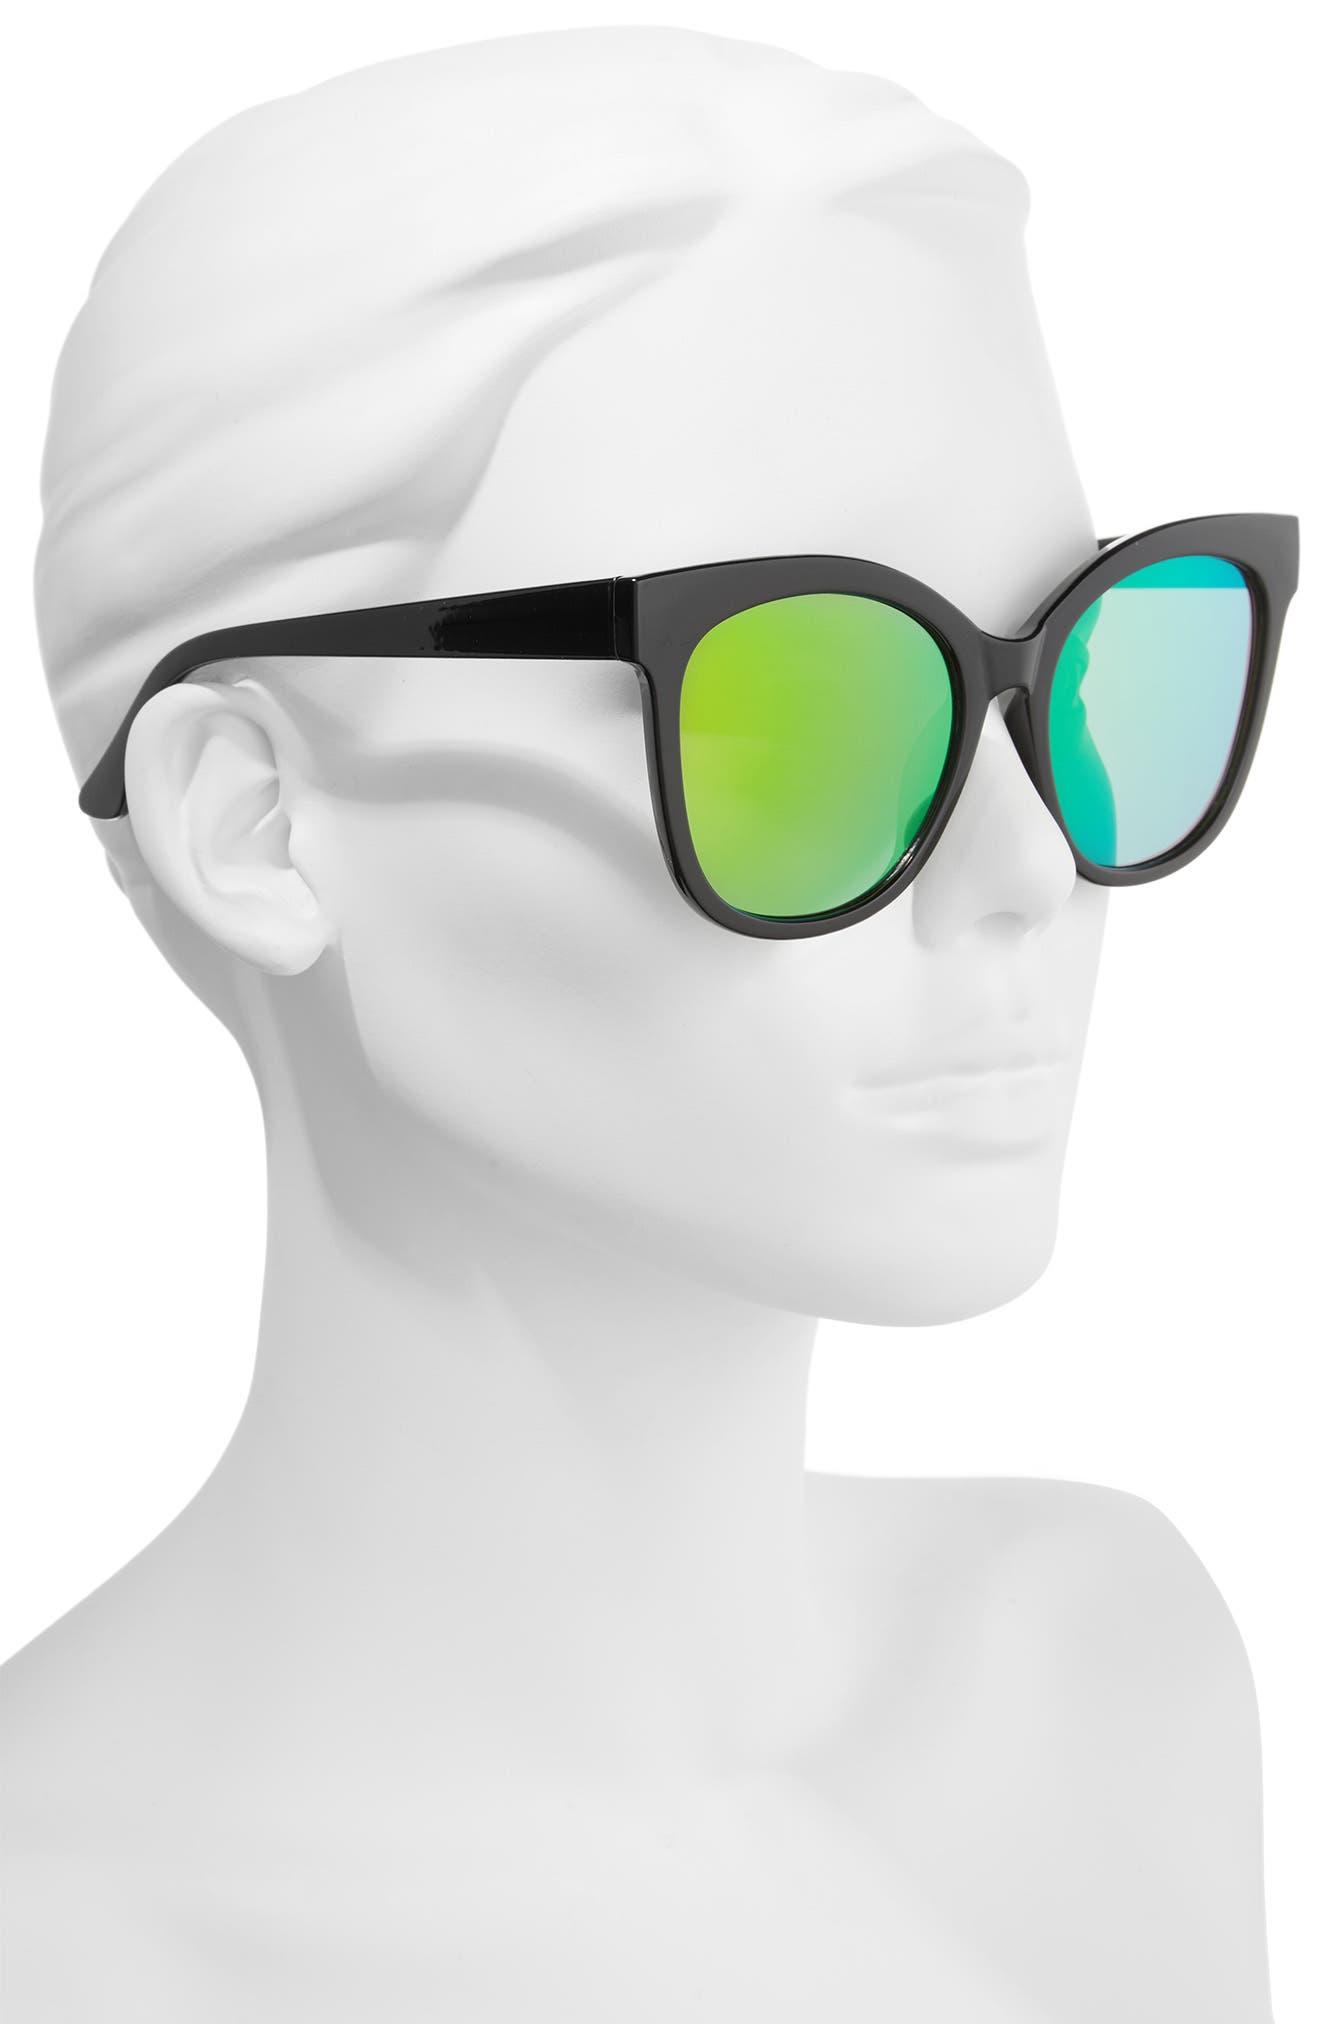 55mm Square Sunglasses,                             Alternate thumbnail 2, color,                             Black/ Pink